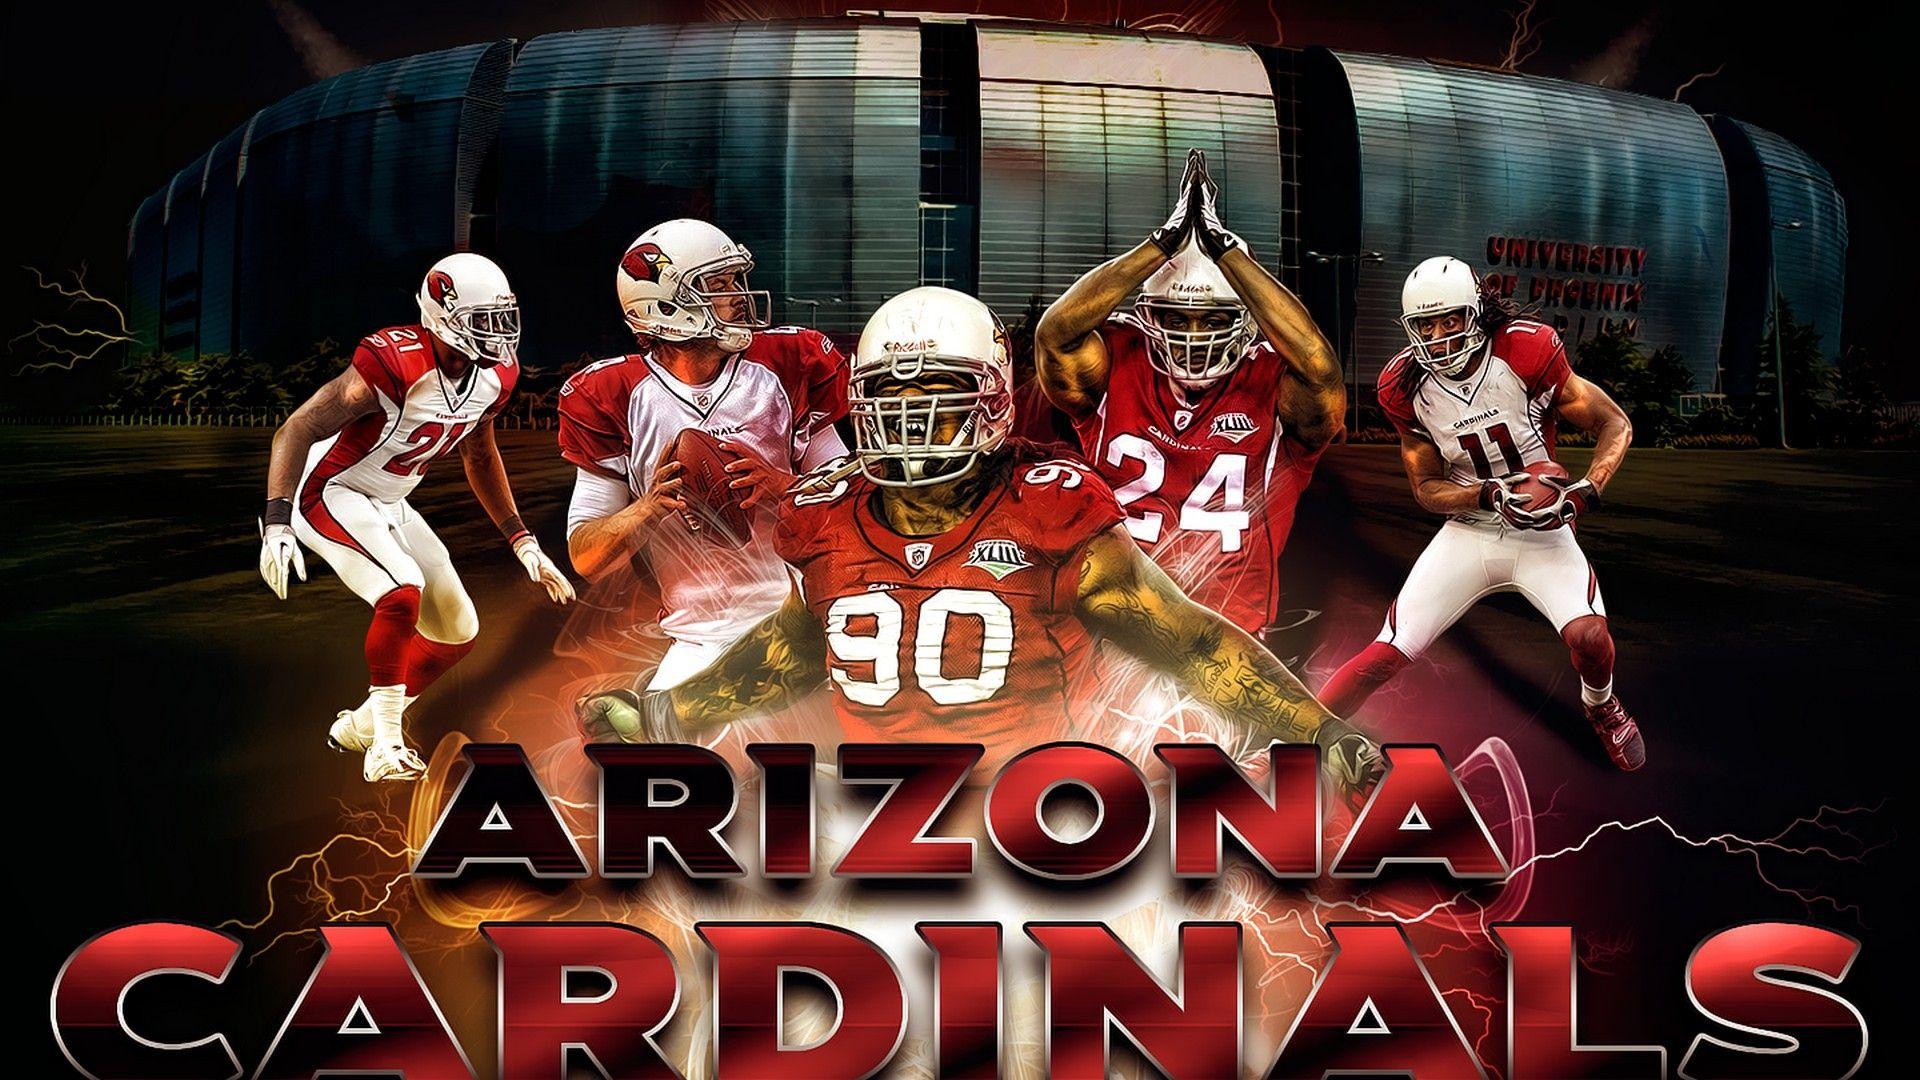 Nfl Wallpapers Arizona Cardinals Wallpaper Arizona Cardinals Cardinals Wallpaper